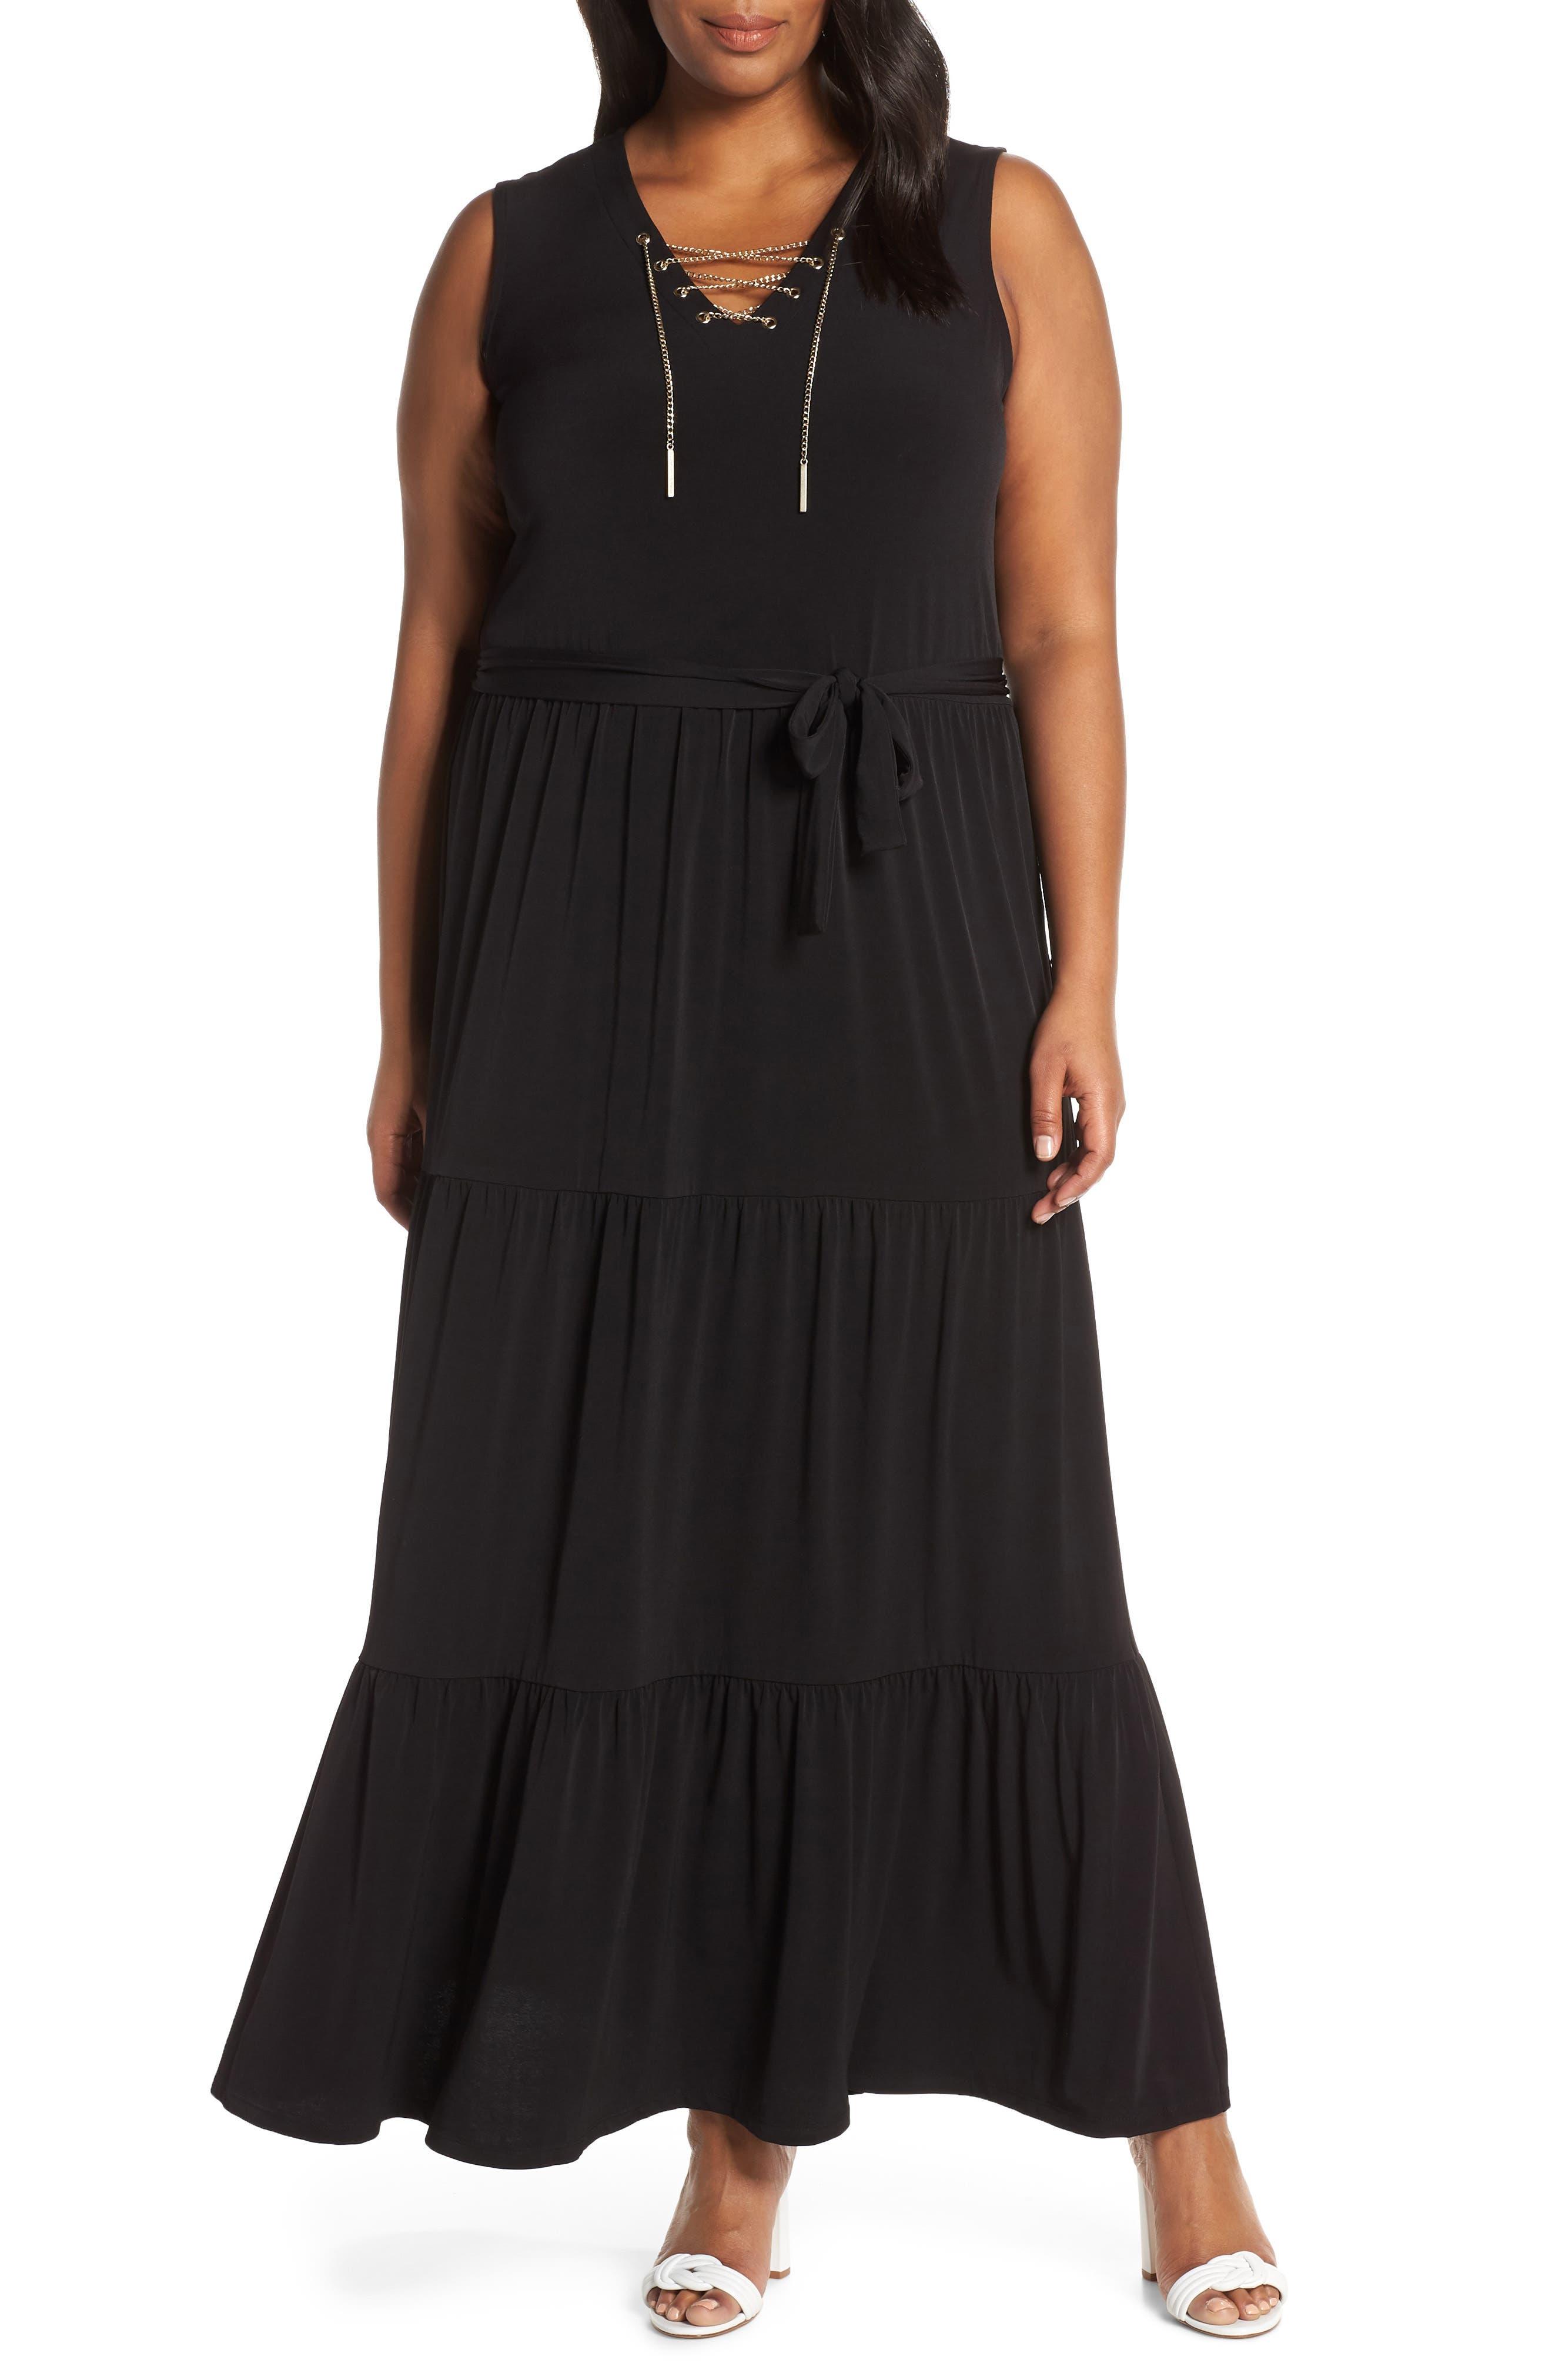 Plus Size Michael Michael Kors Lace Up Stretch Knit Maxi Dress, Black